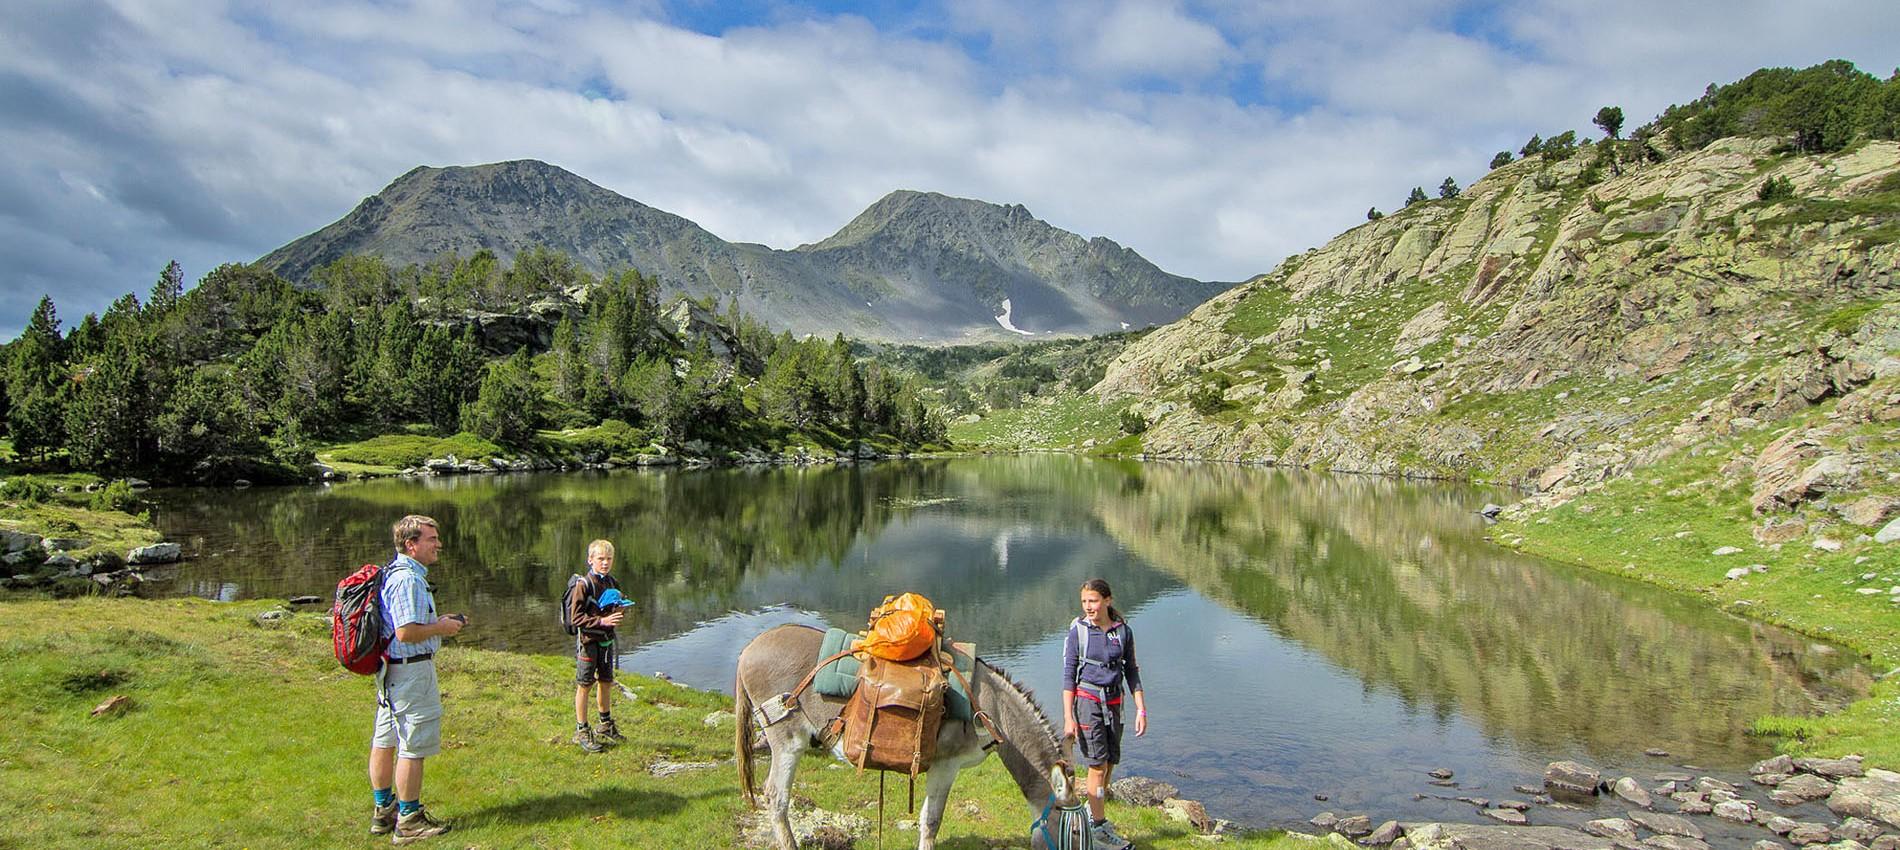 randonnée avec ânes camporells